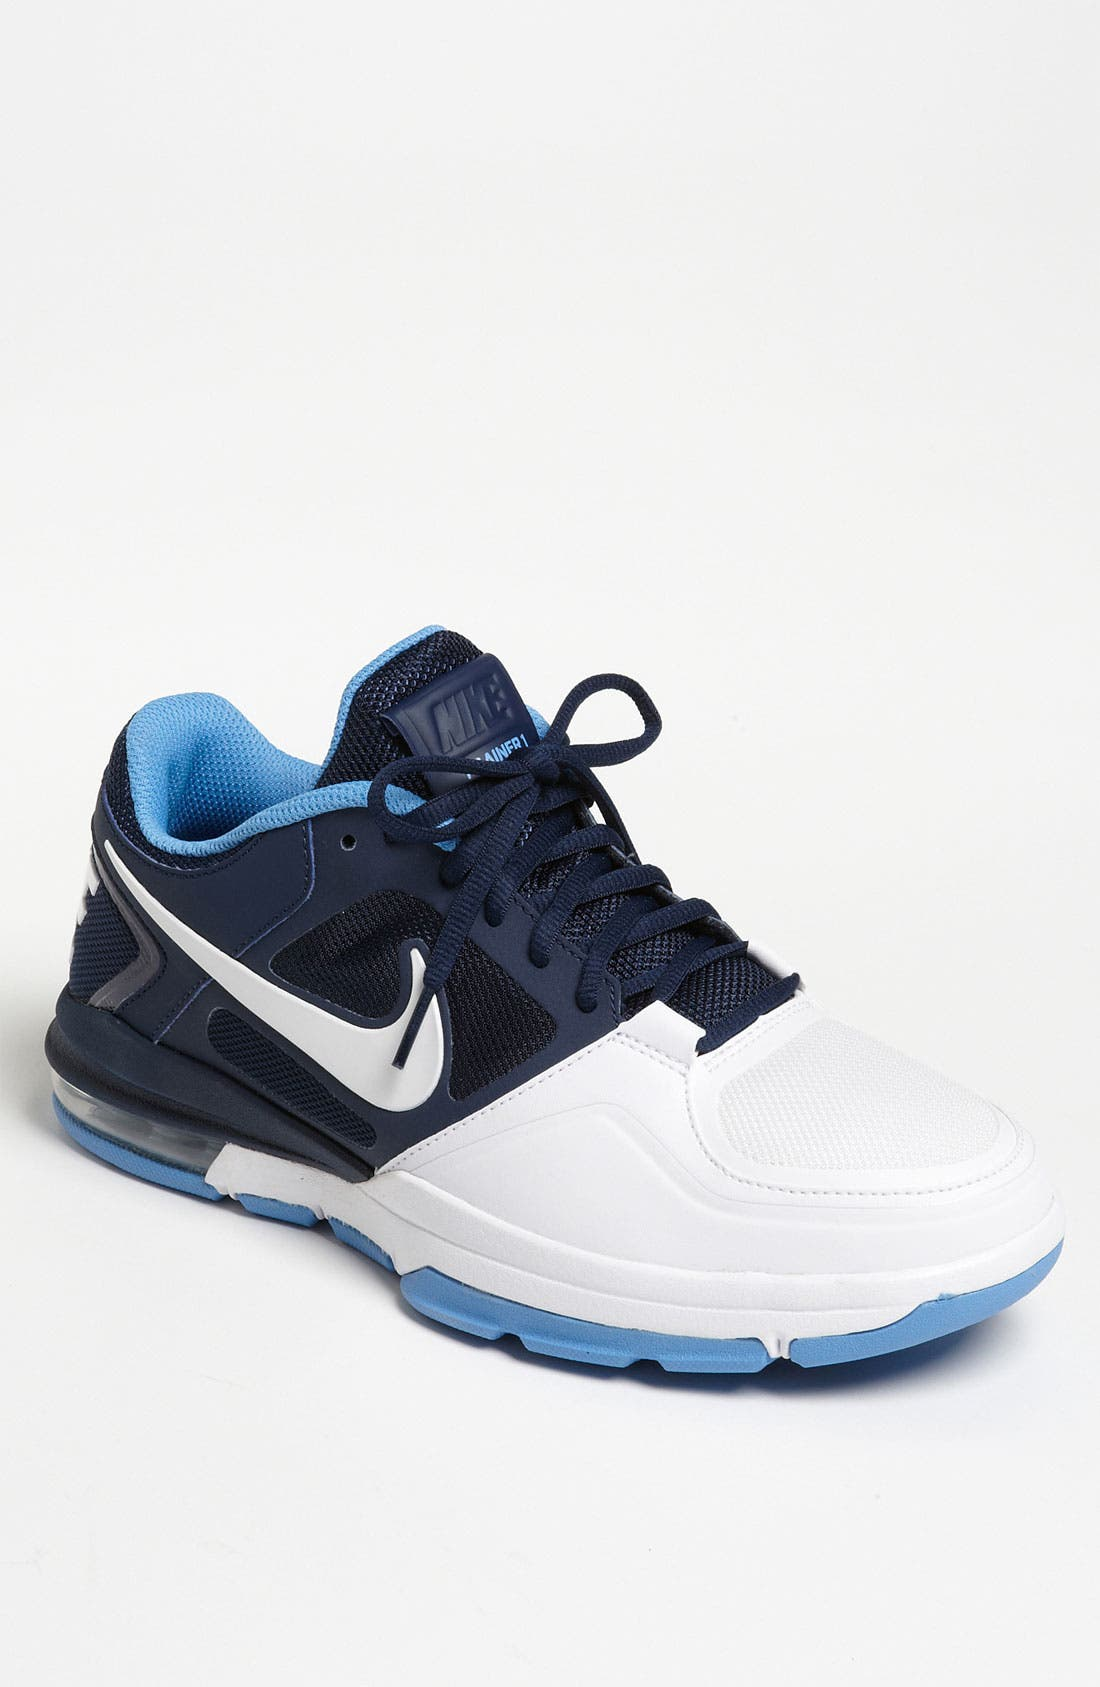 NIKE 'Trainer 1.3 Low' Training Shoe, Main, color, 414